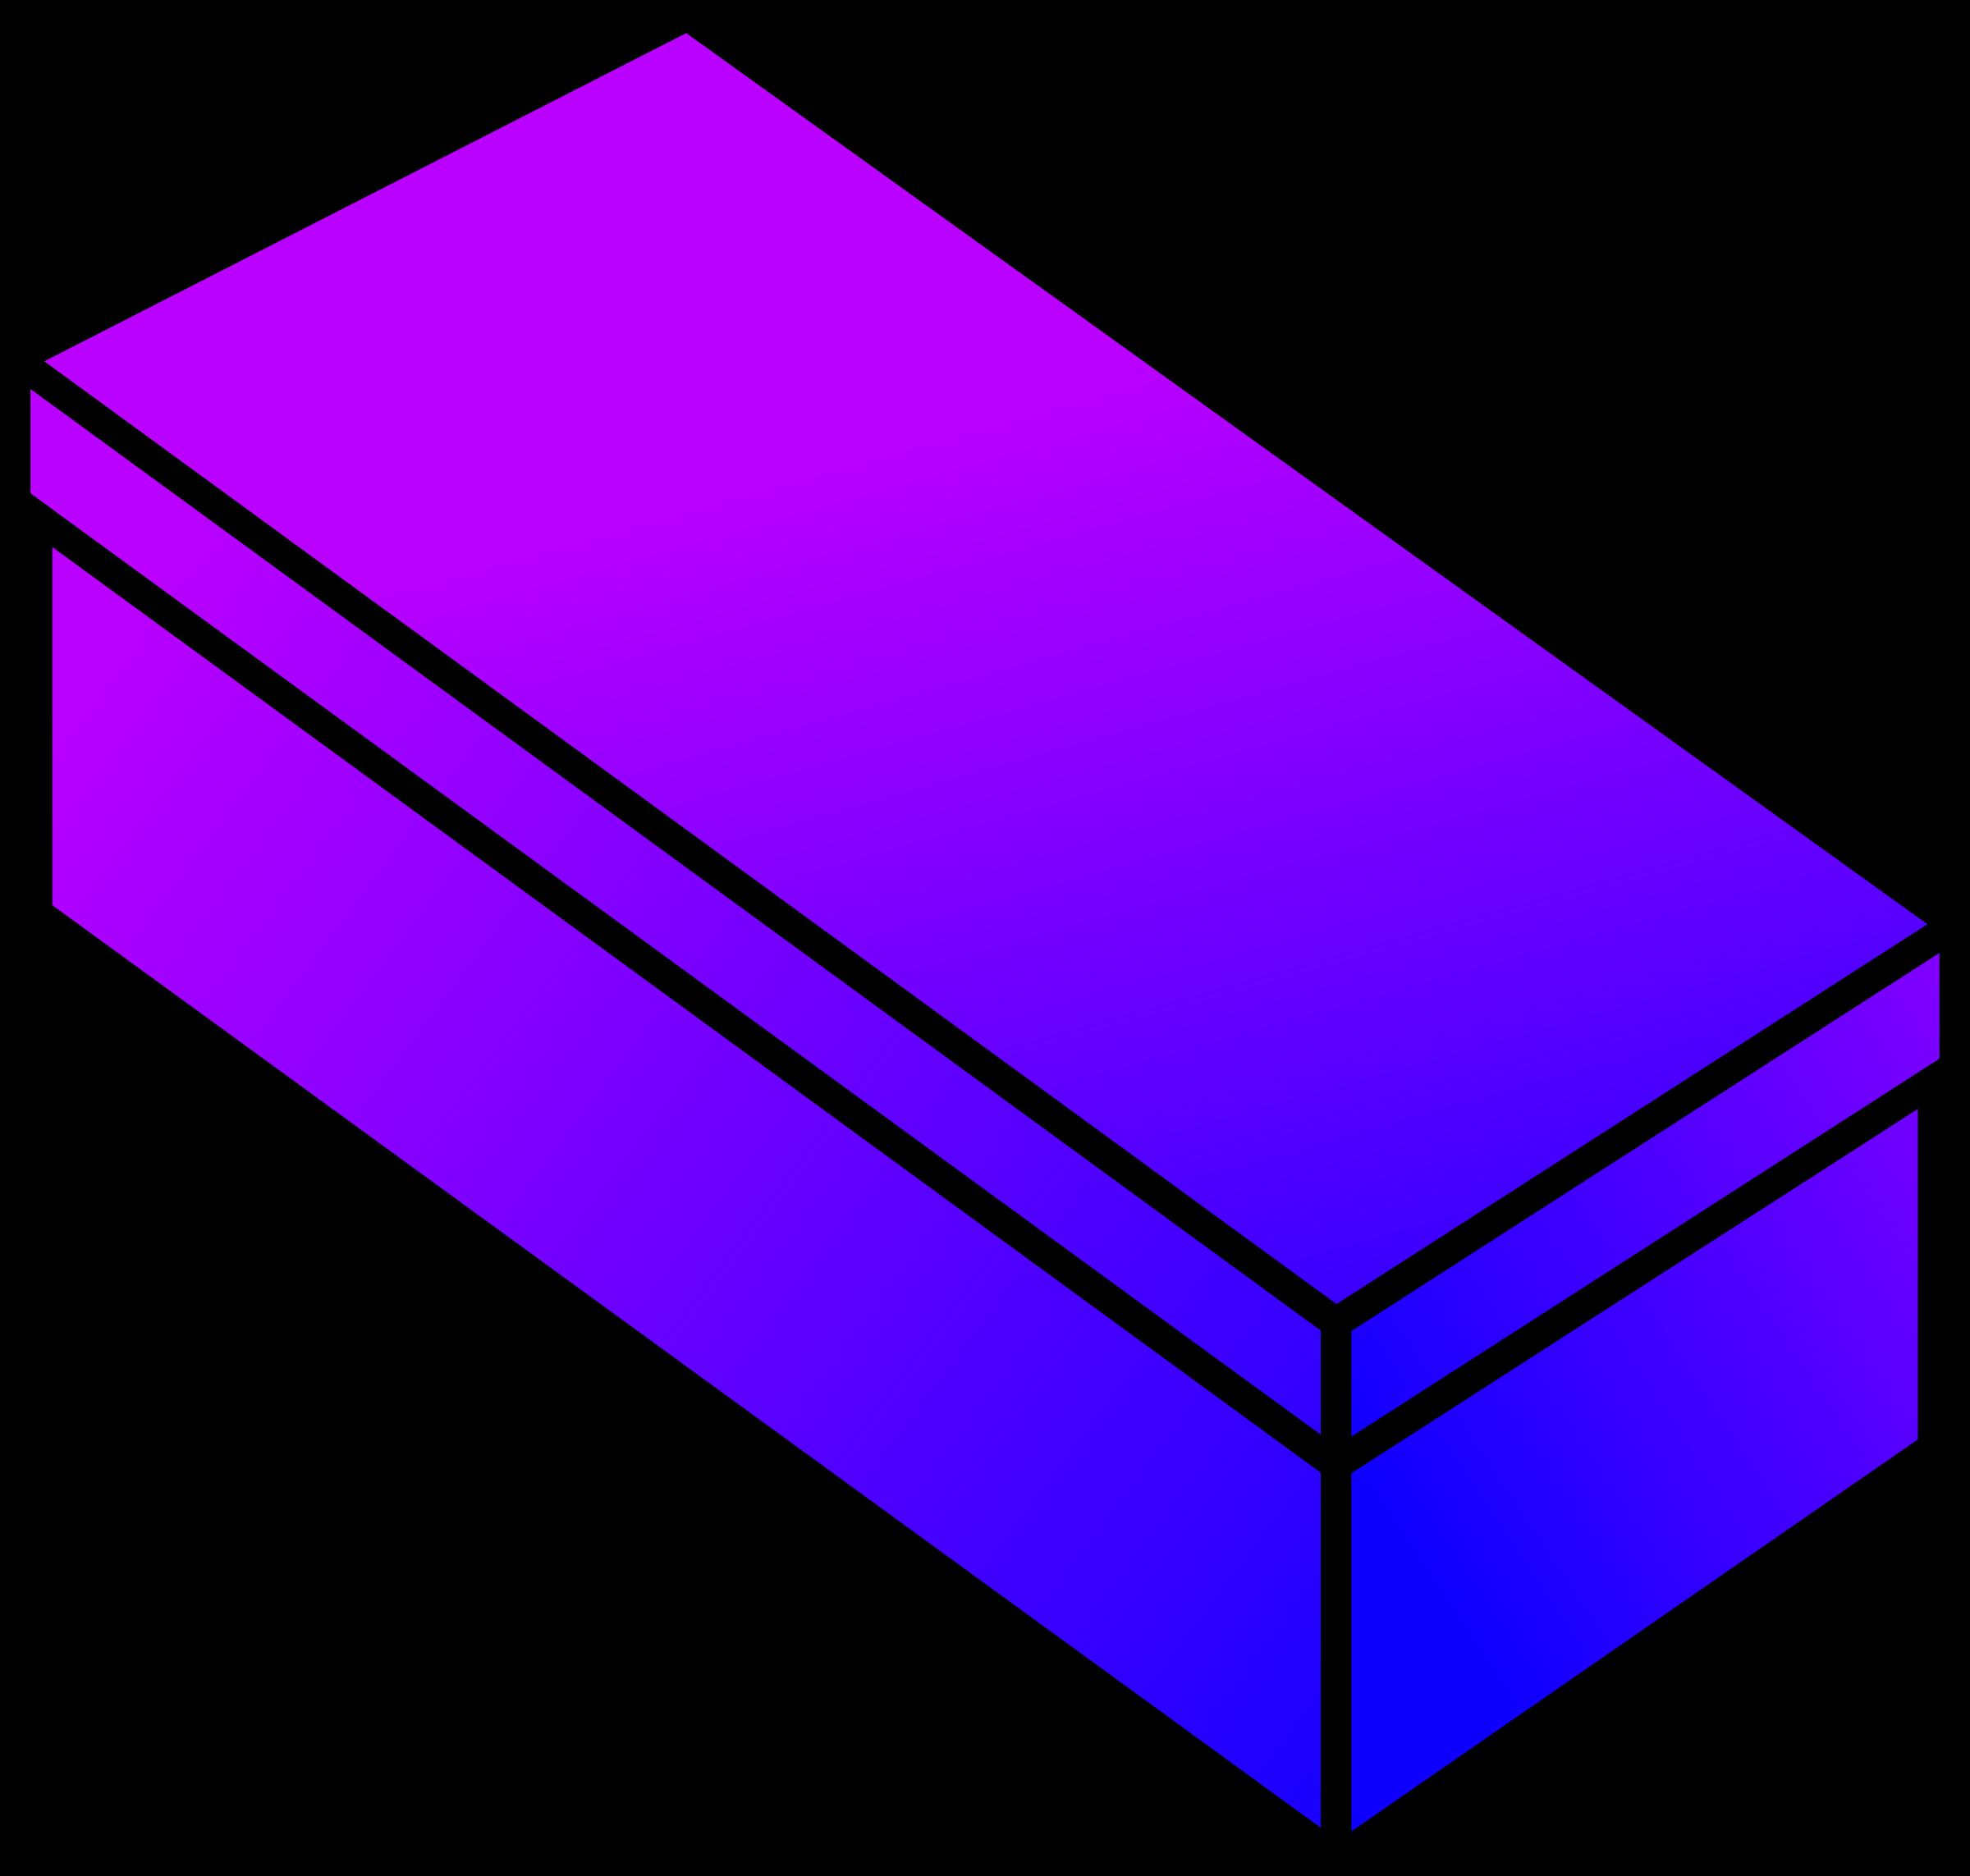 Clipart box rectangular box. Shoe closed big image